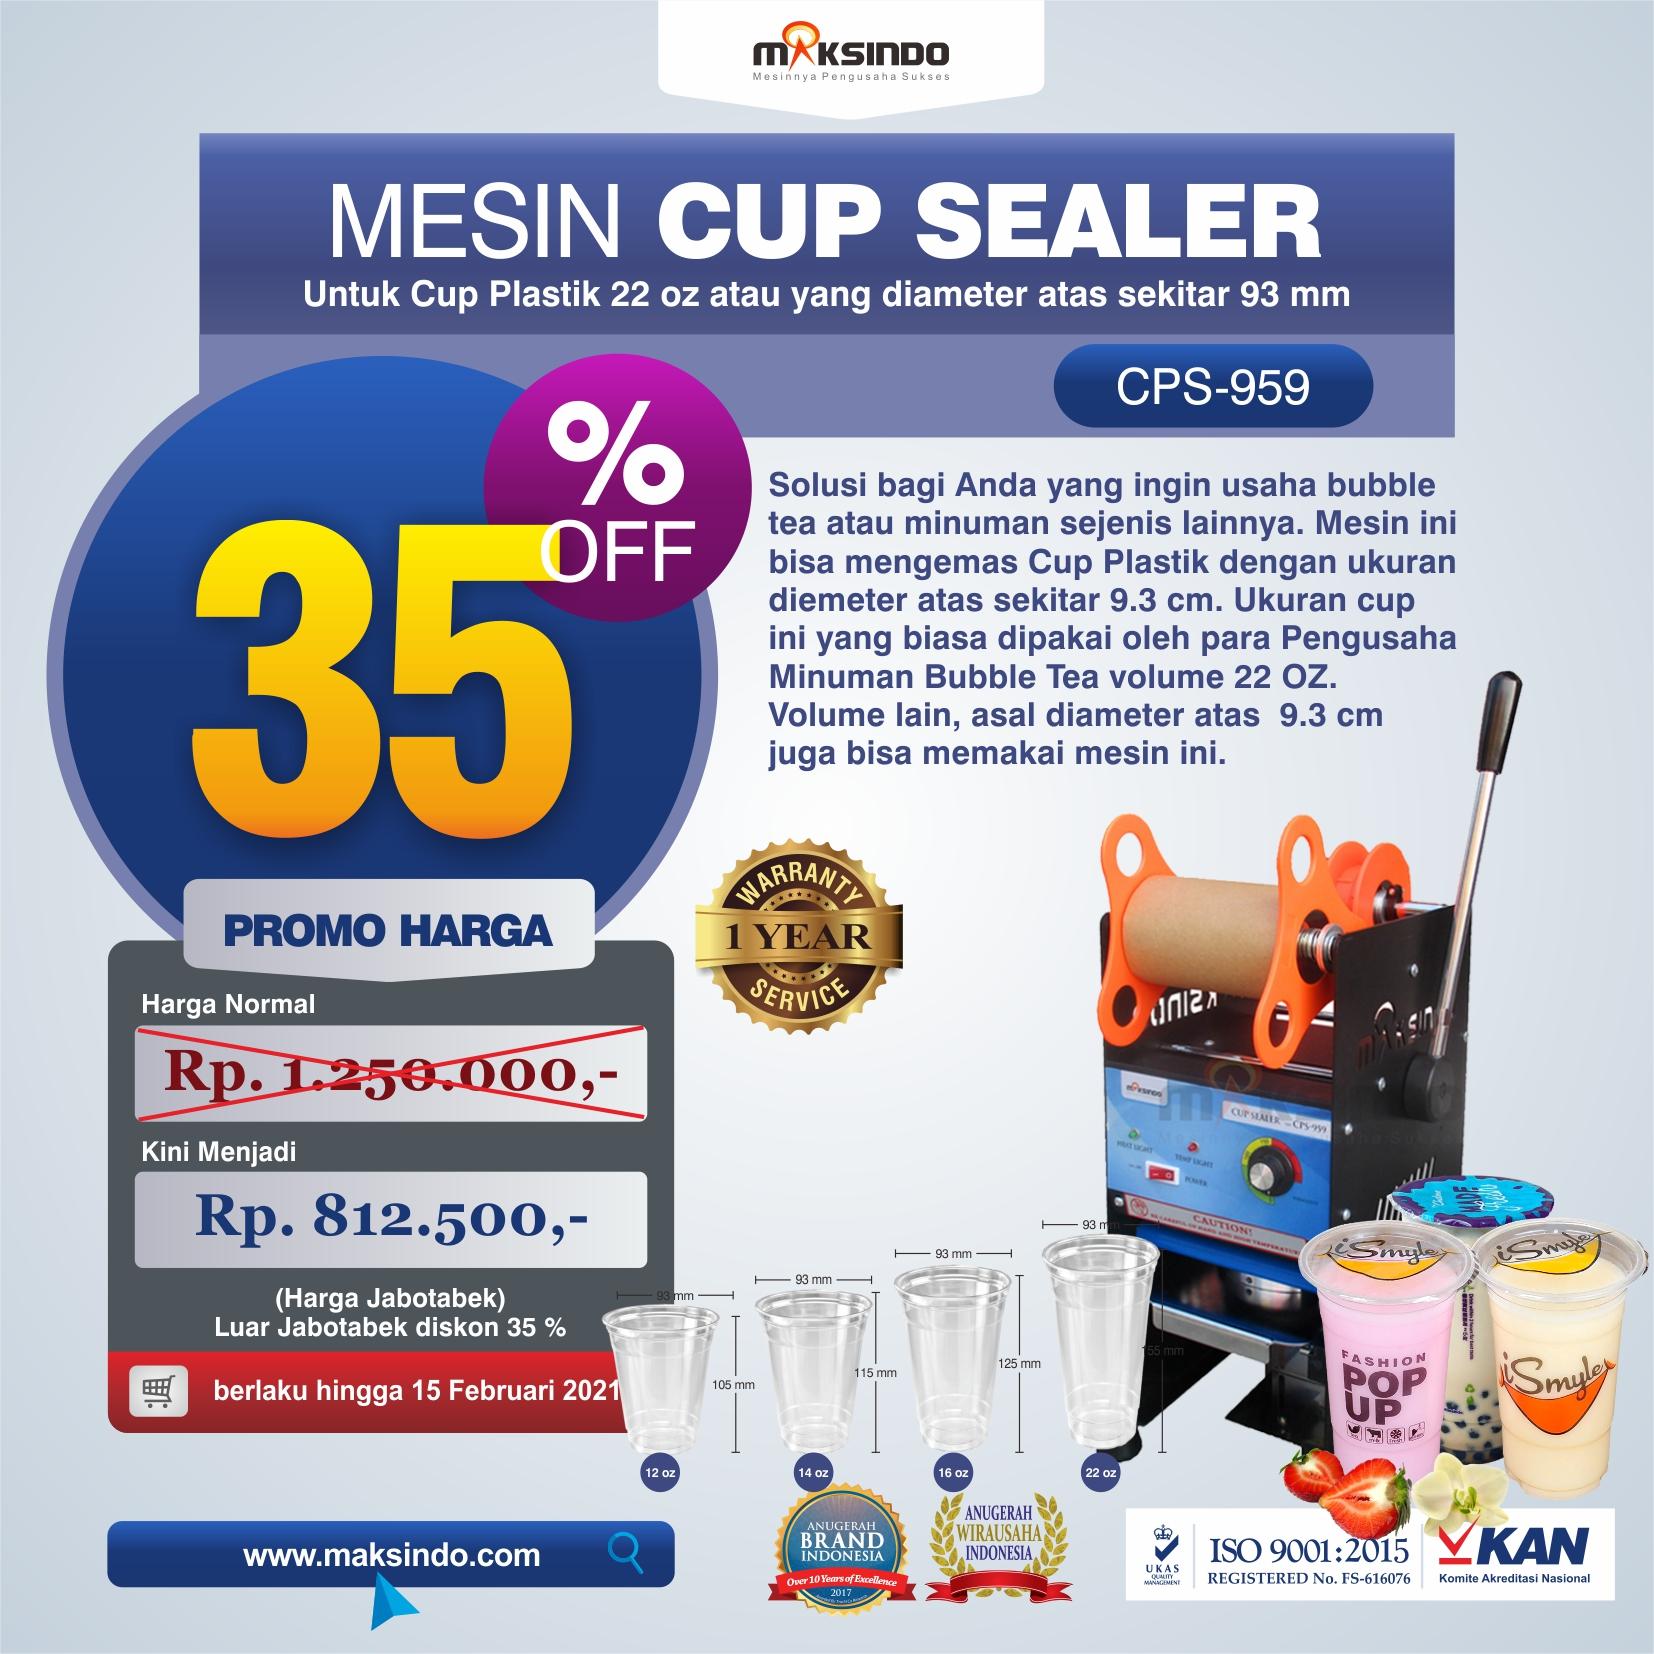 Mesin Cup Sealer CPS-959